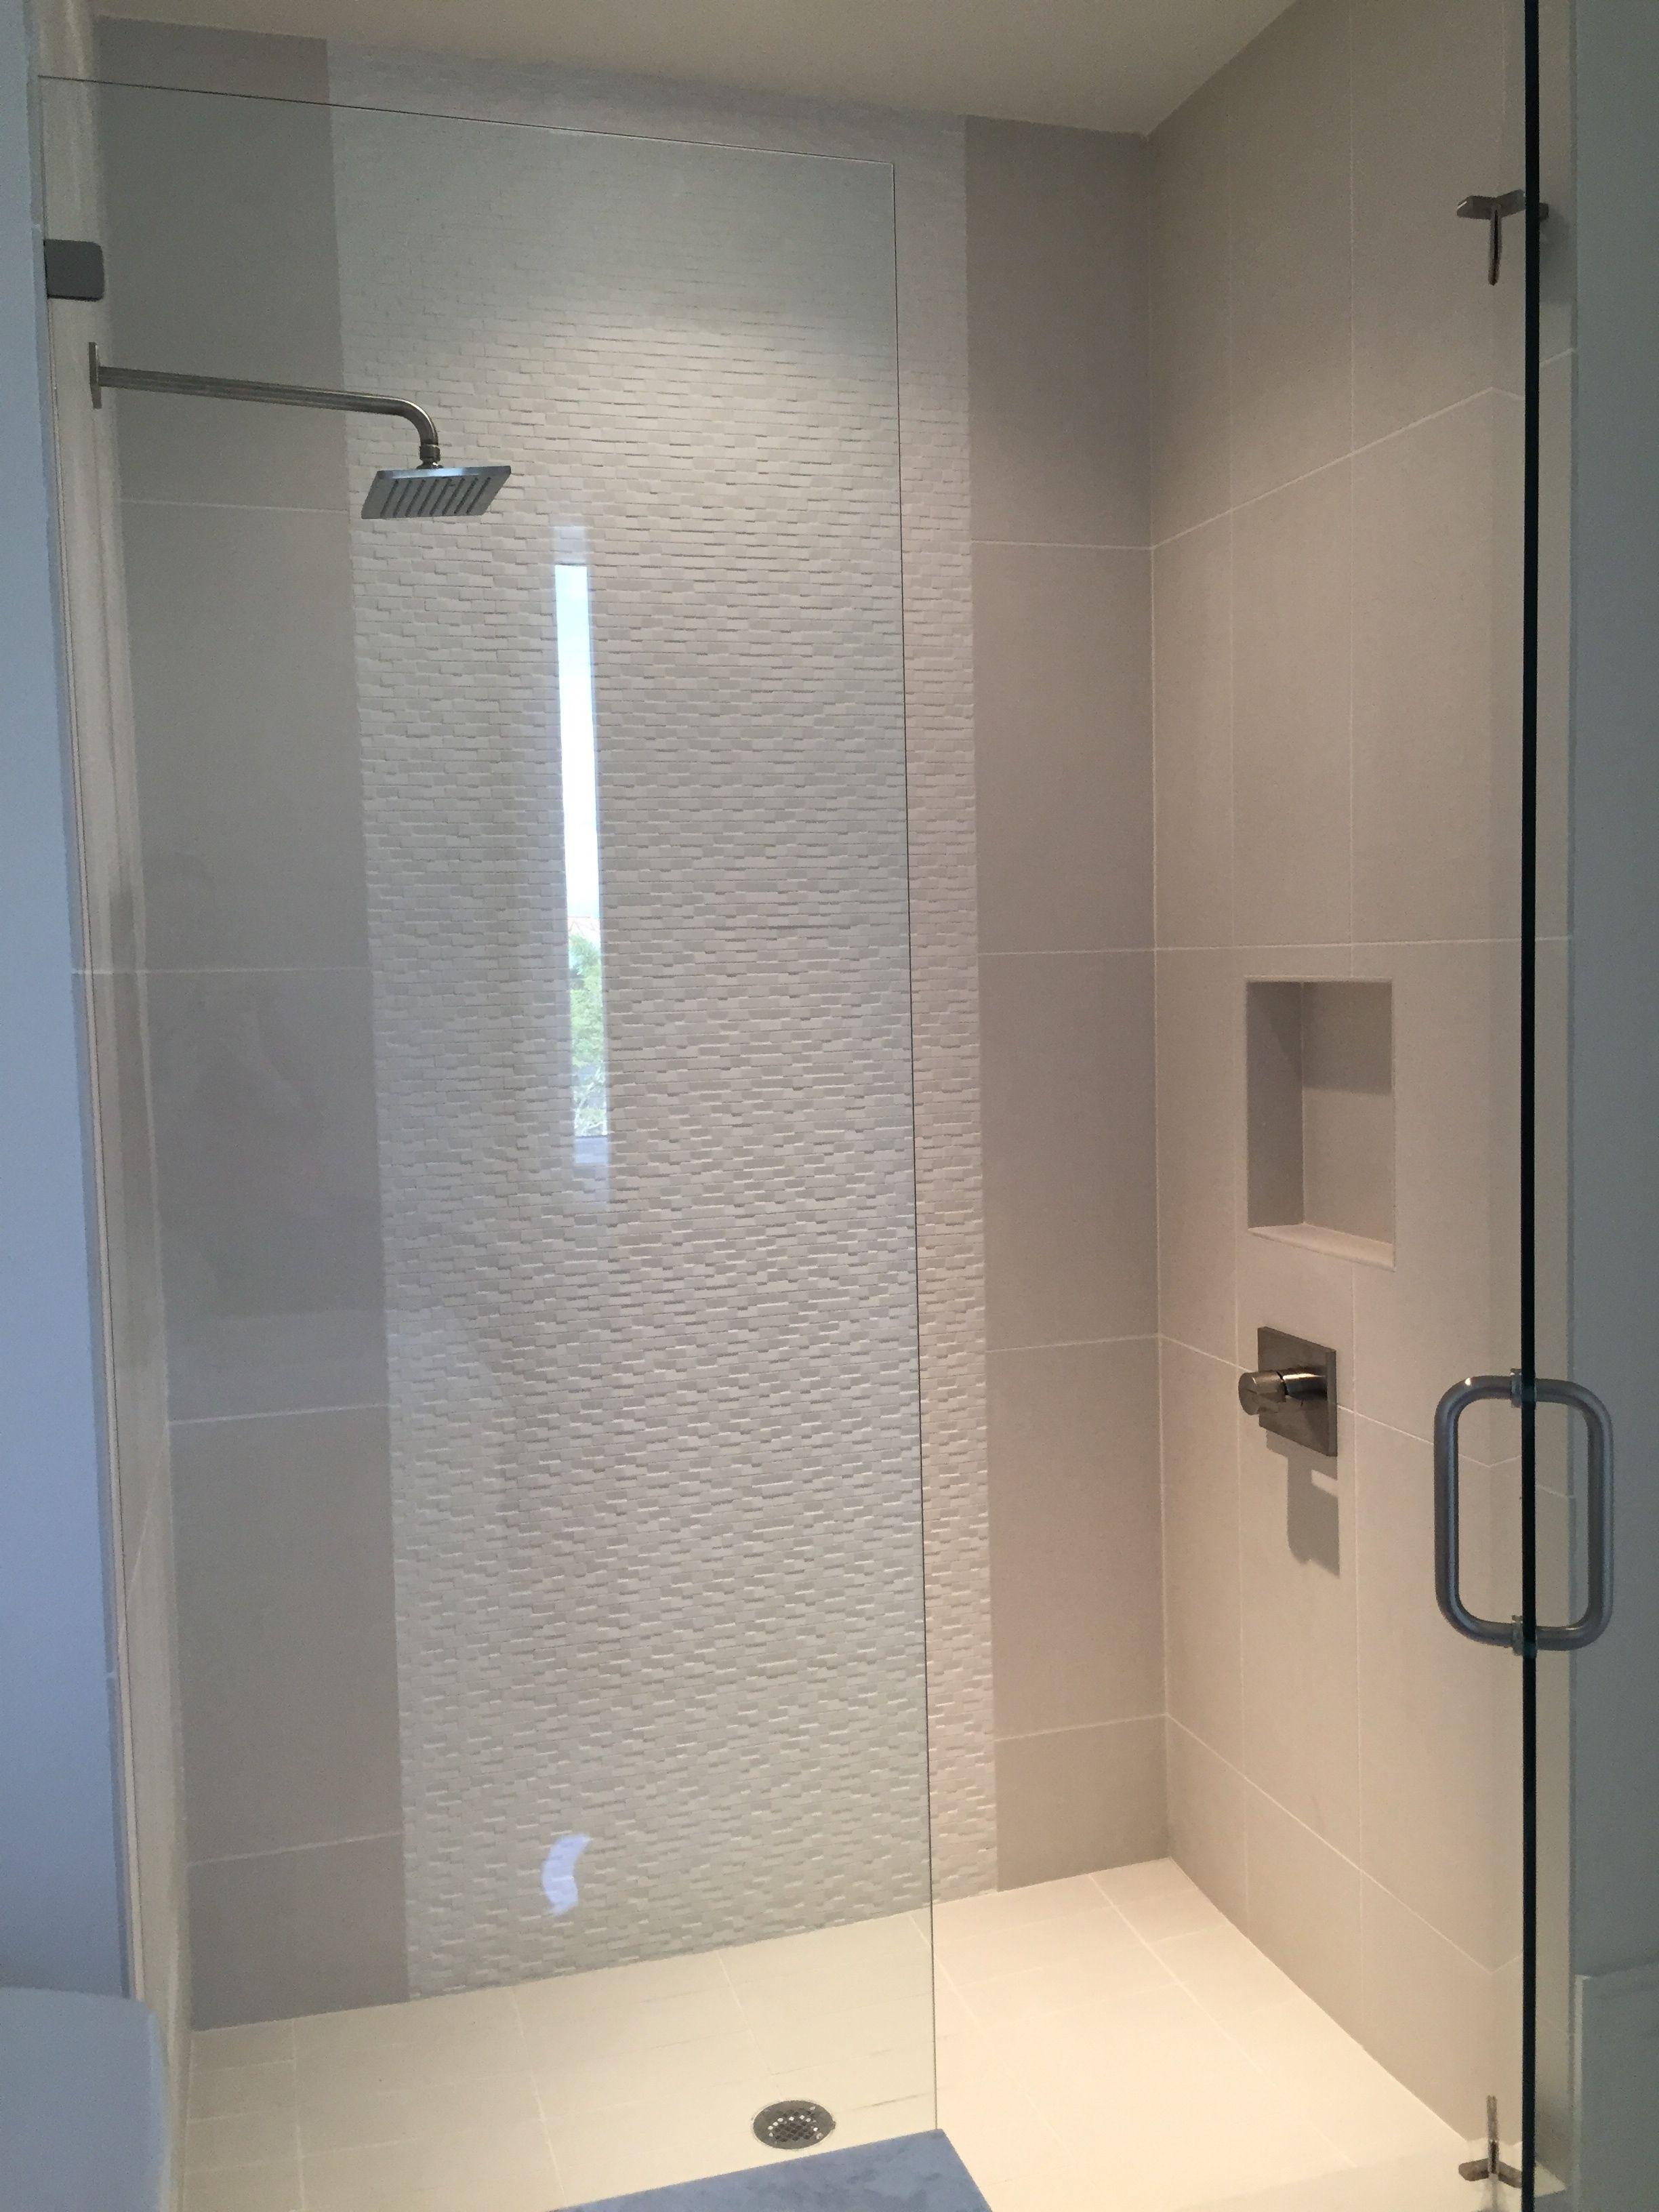 splendor shower jdsmithcustomhomesllc livin area doors com